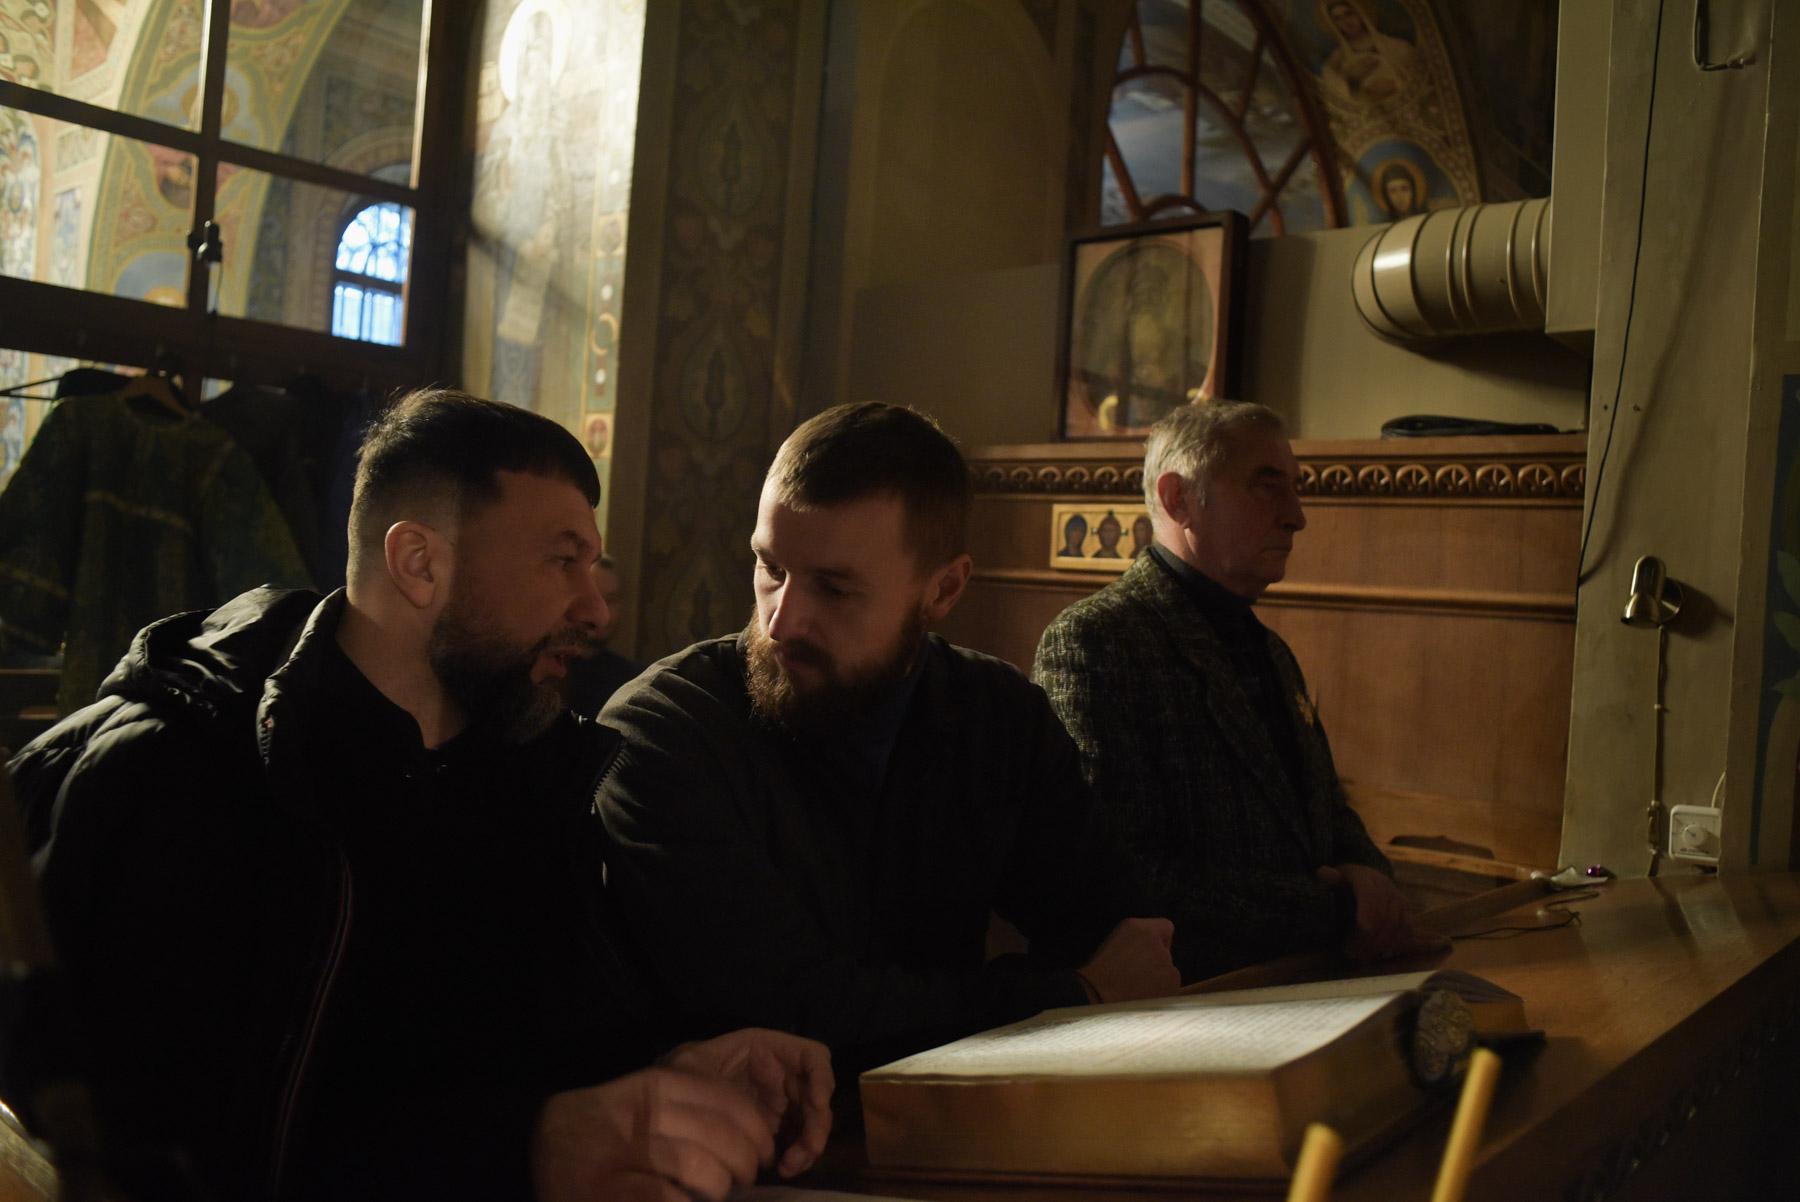 photos of orthodox christmas 0023 2